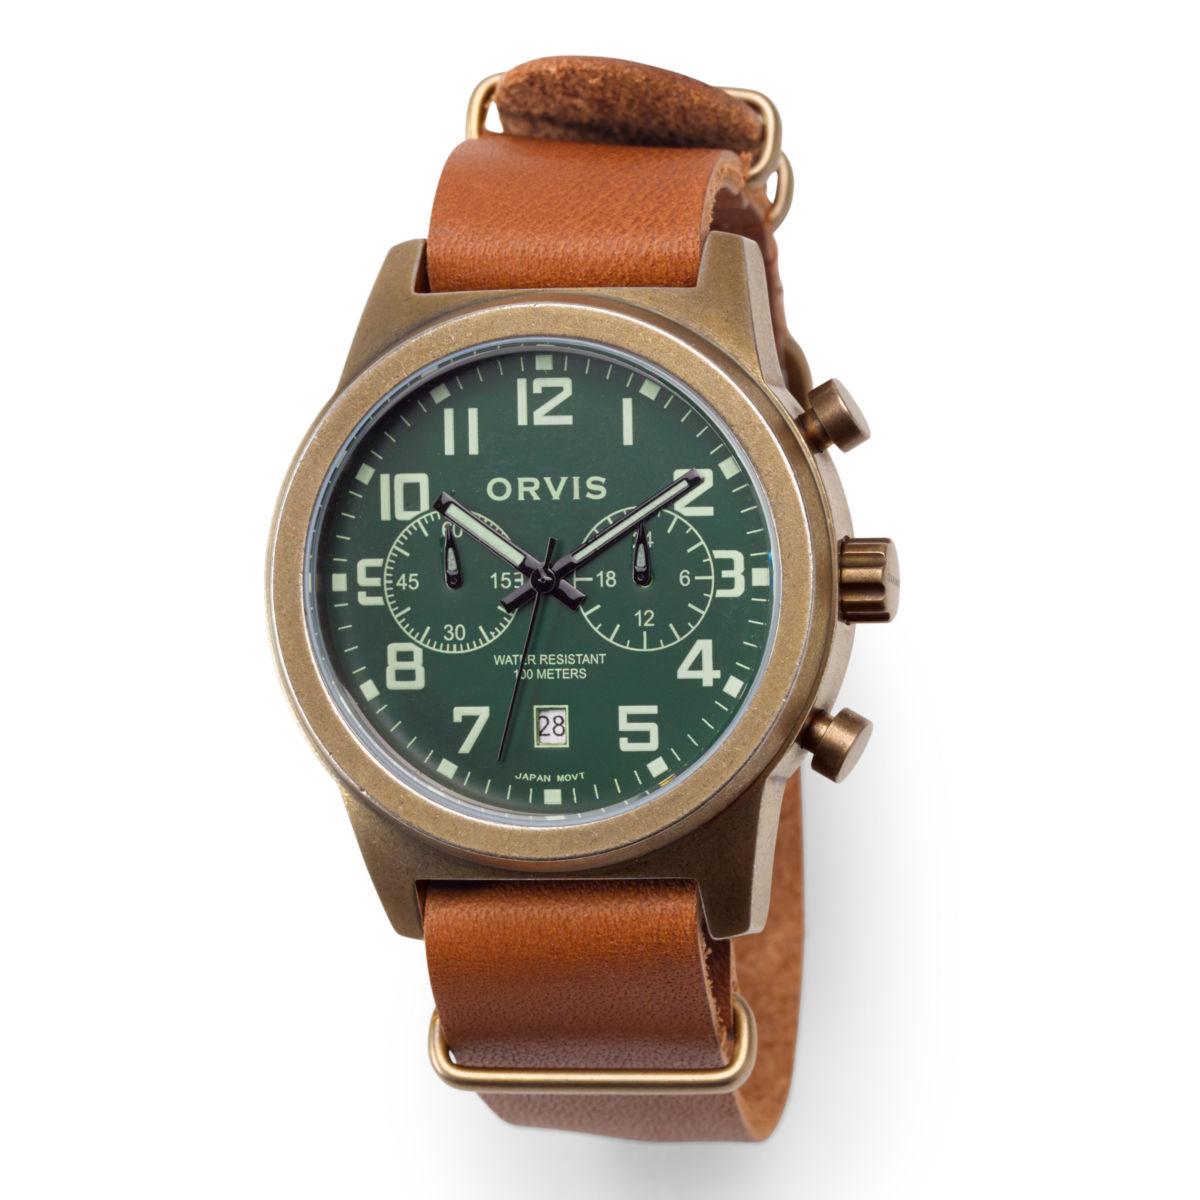 Vintage Leather Field Watch - OLIVEimage number 0